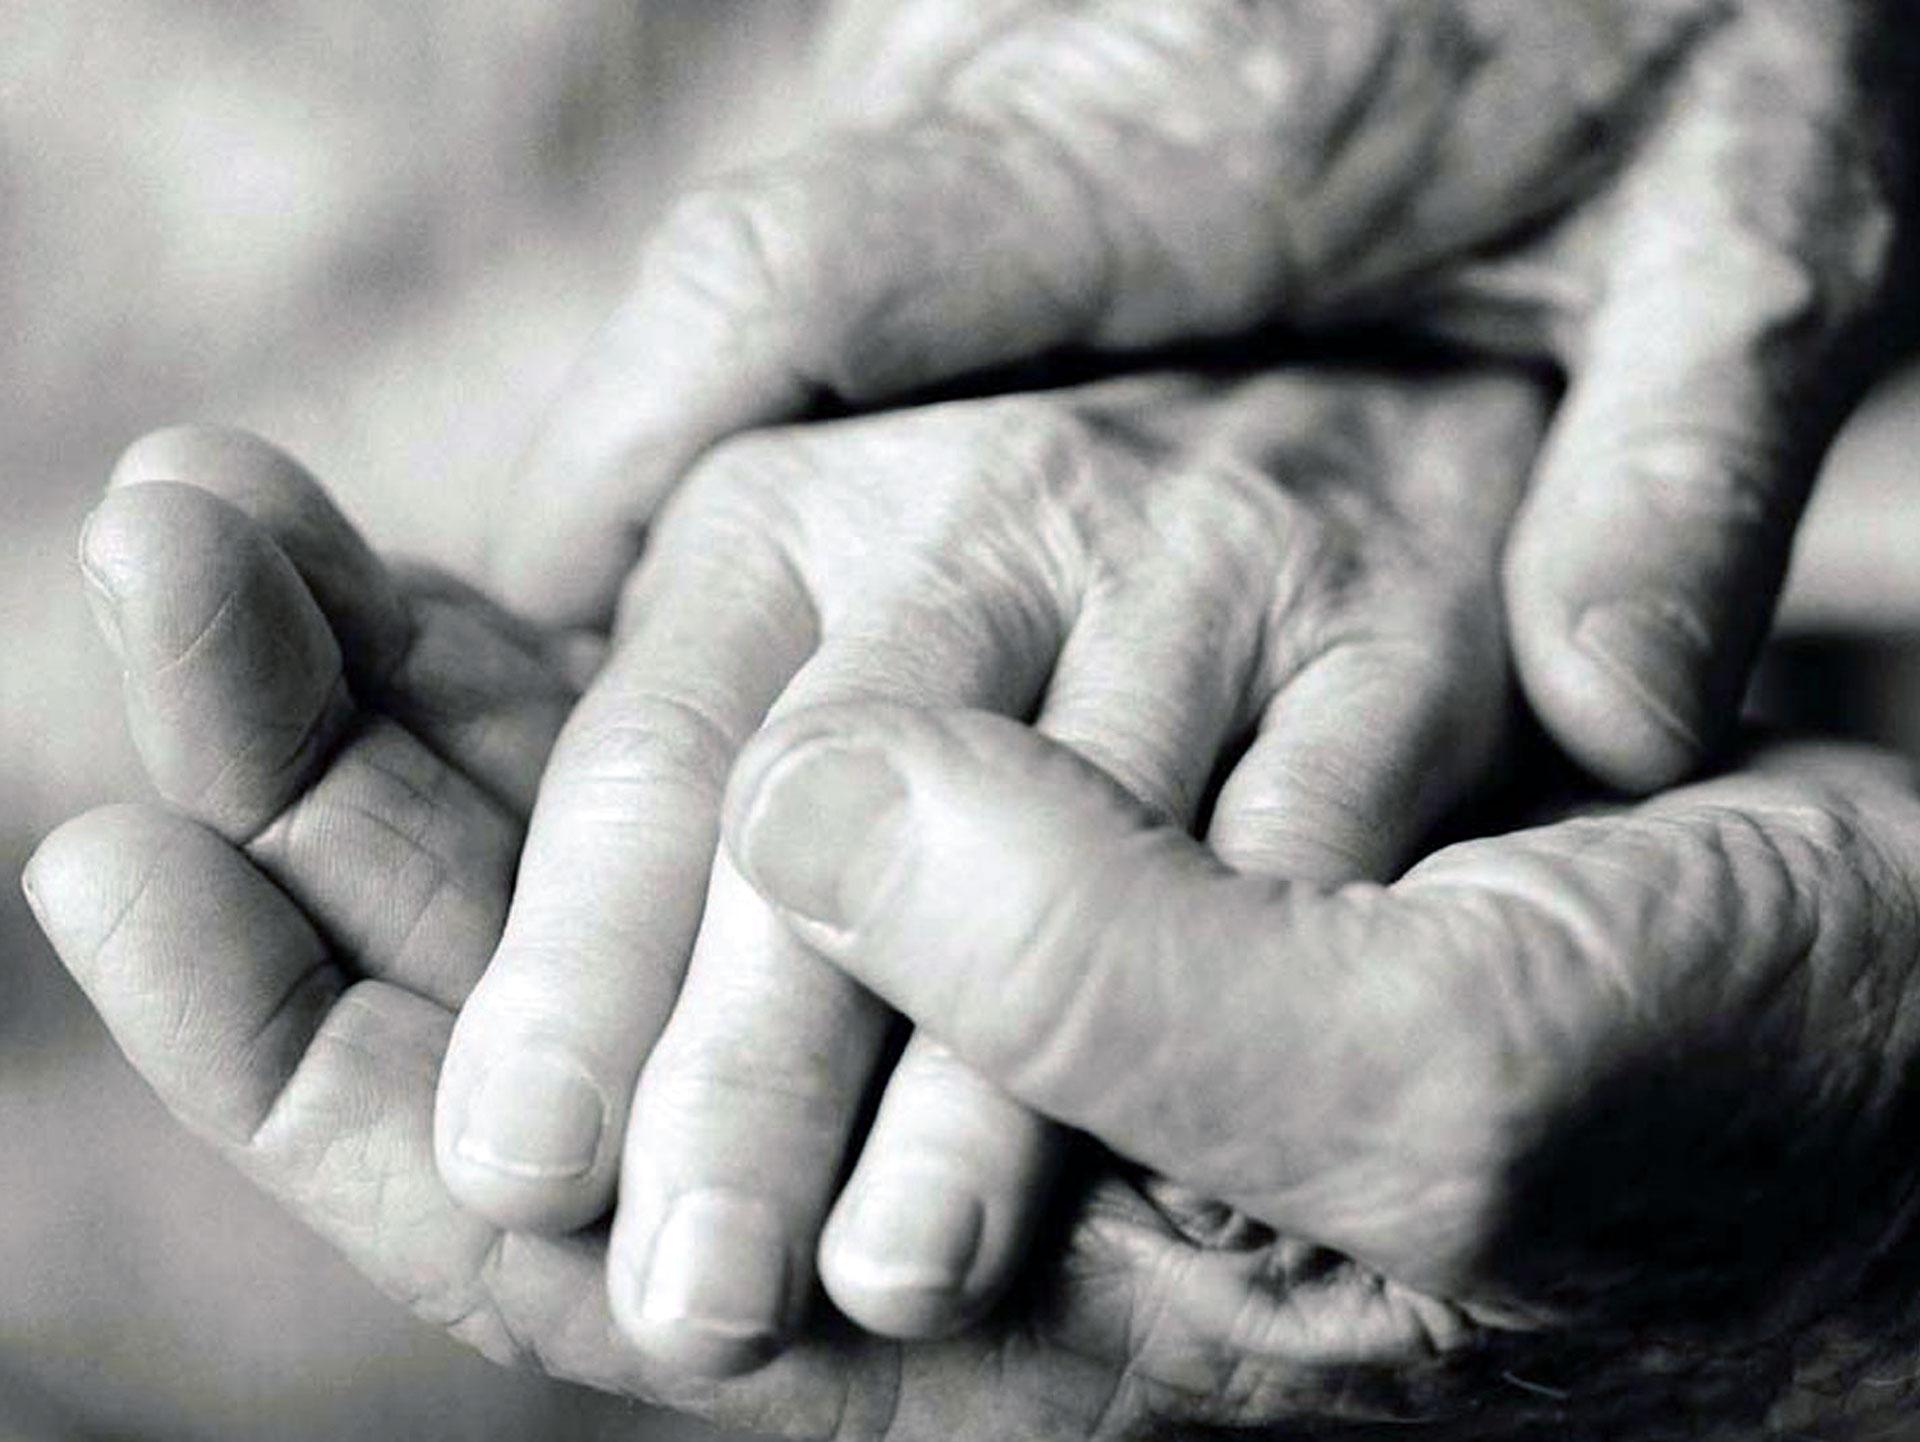 Serviços fúnebres | Atendimento personaliado